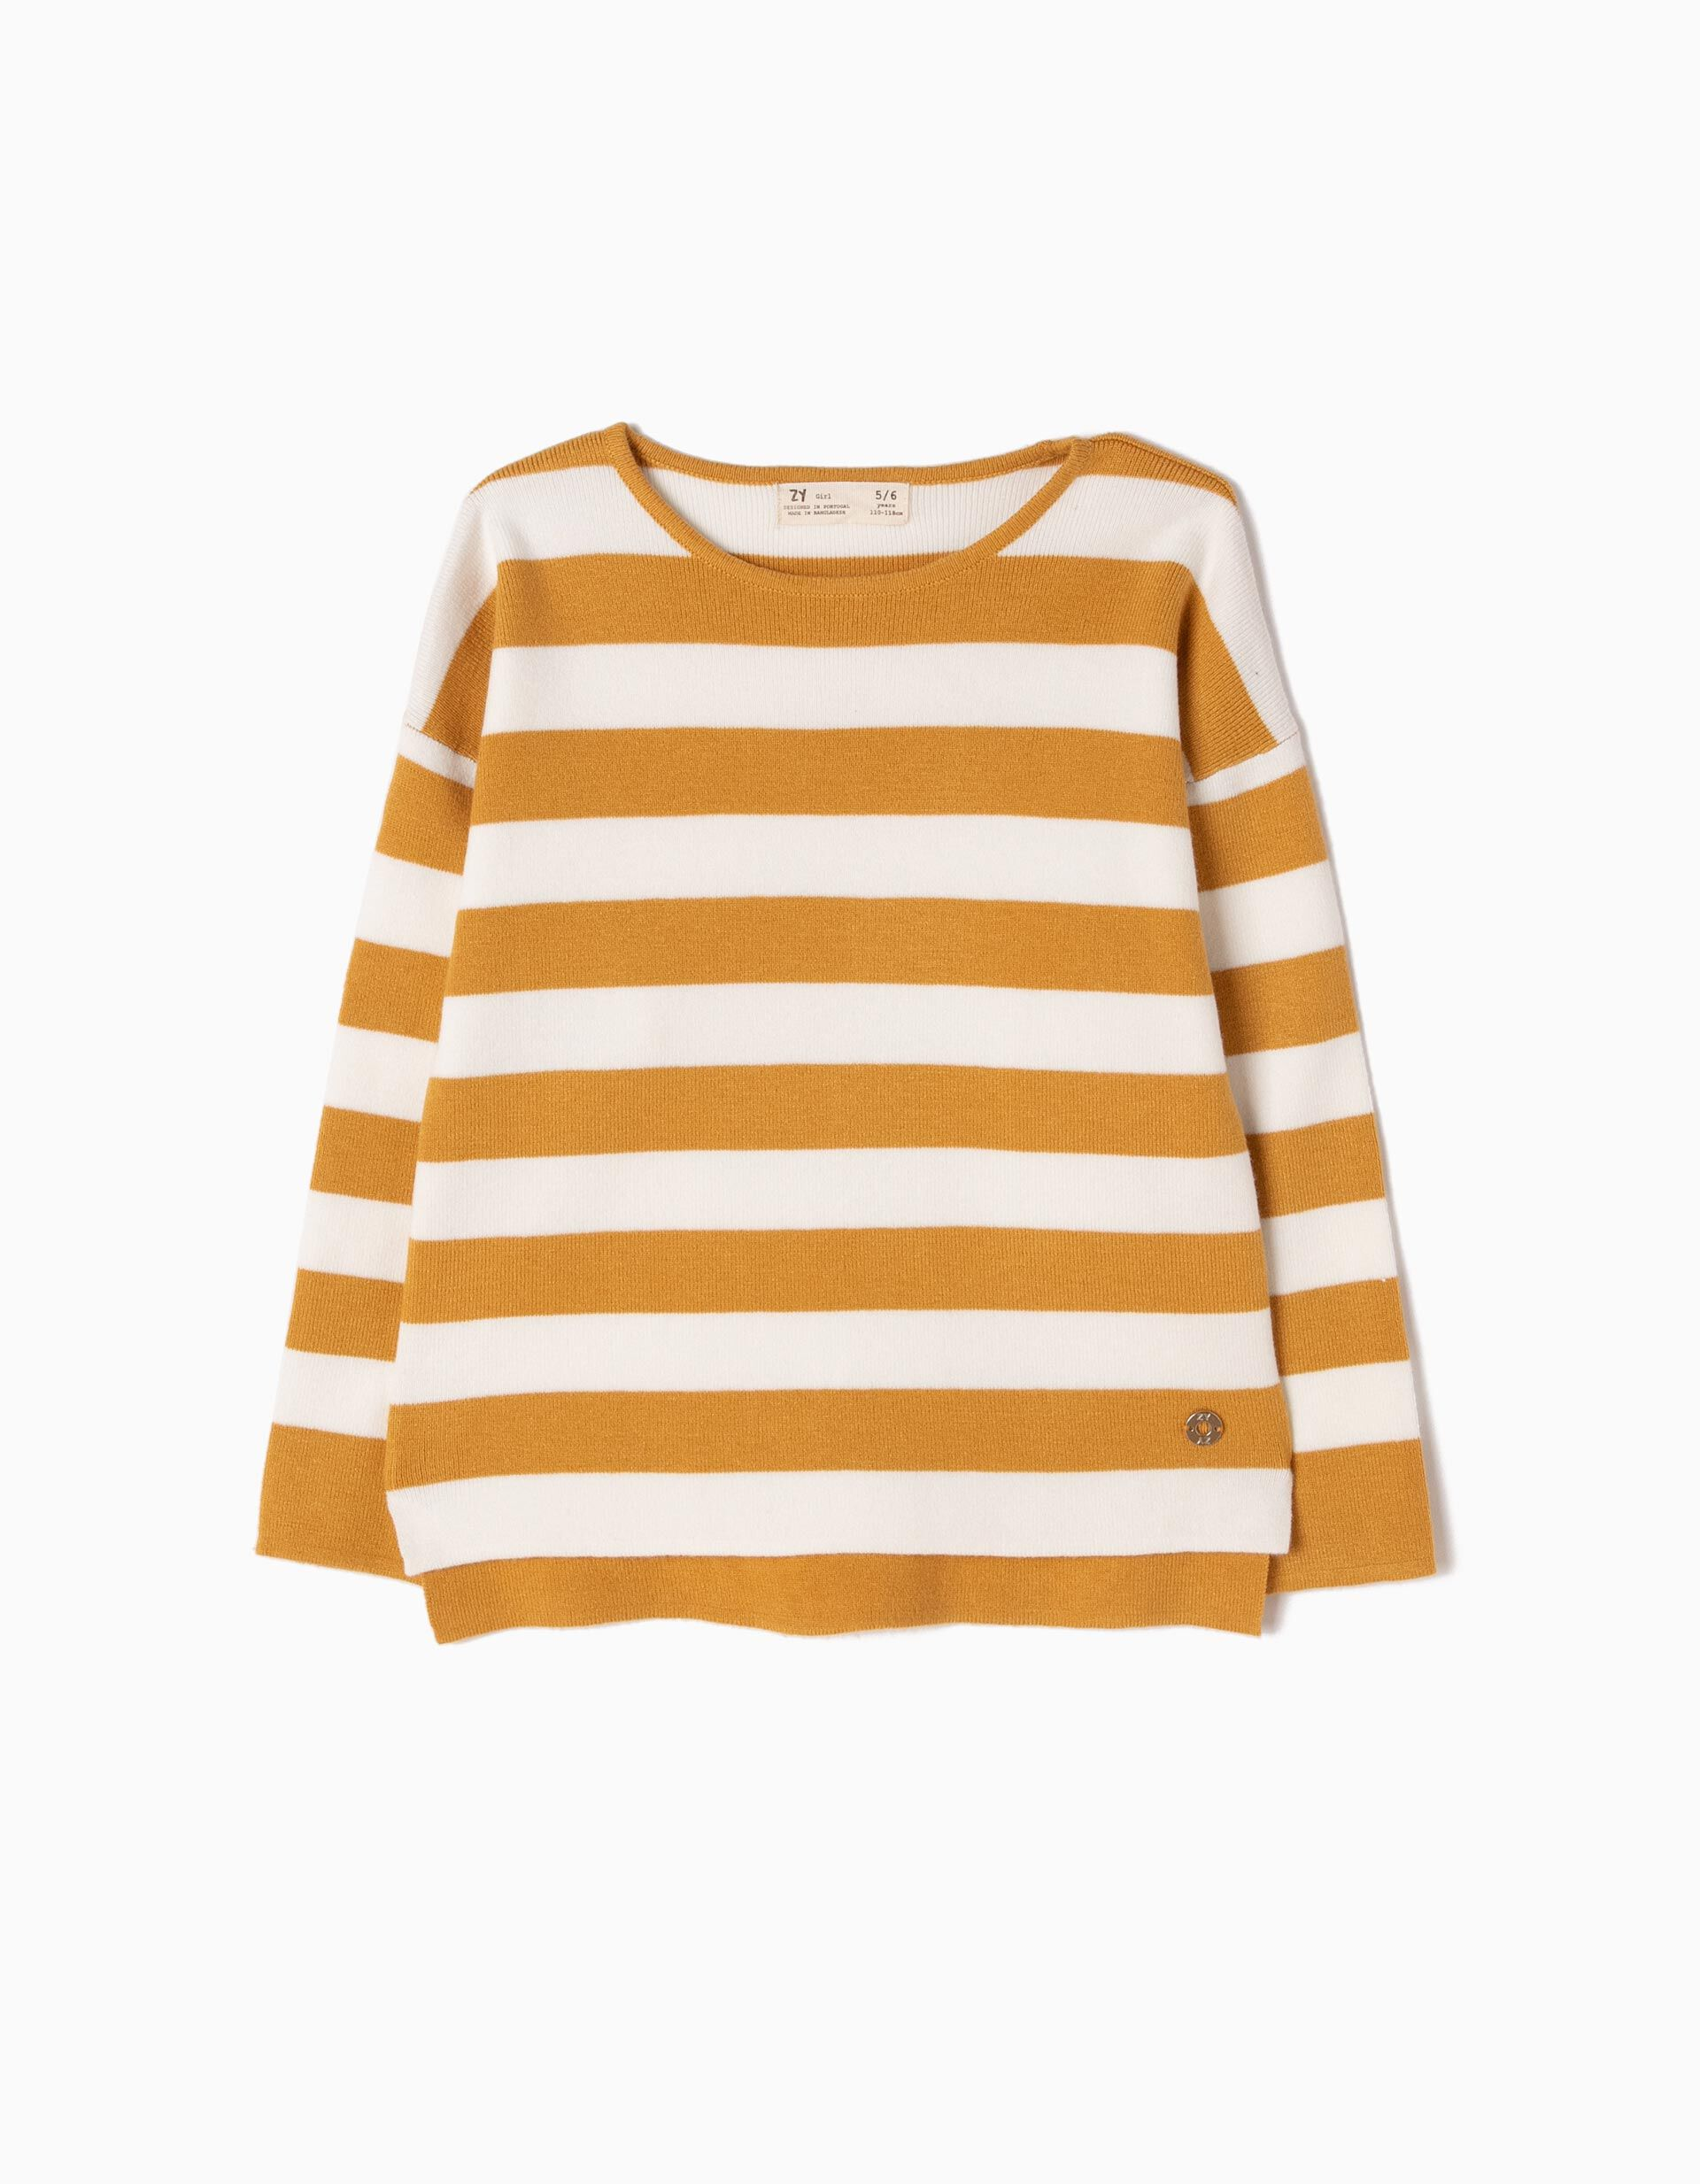 Camisolas & Casacos Roupa para Menina | MO Online